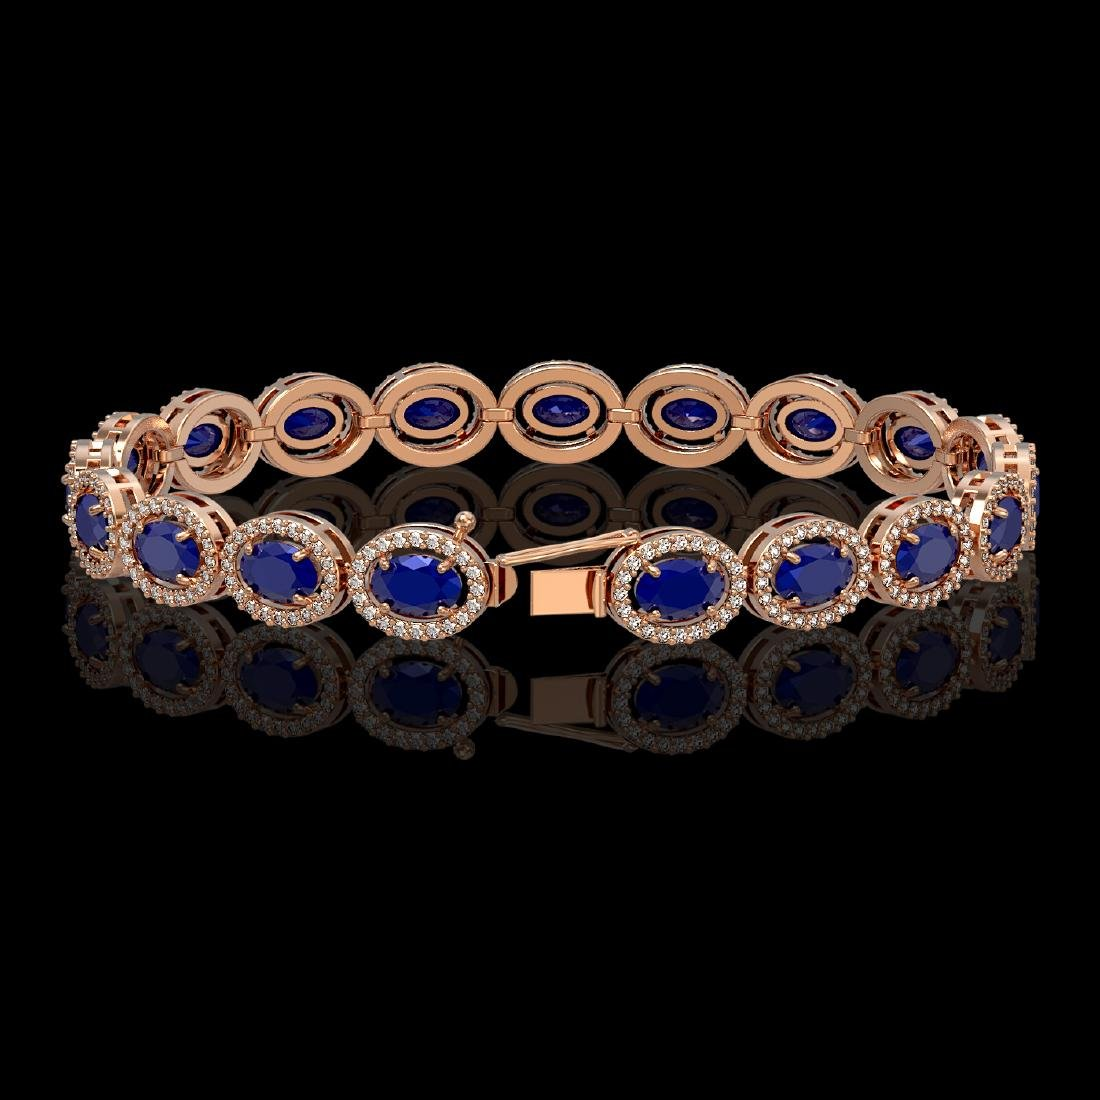 15.2 CTW Sapphire & Diamond Halo Bracelet 10K Rose Gold - 2